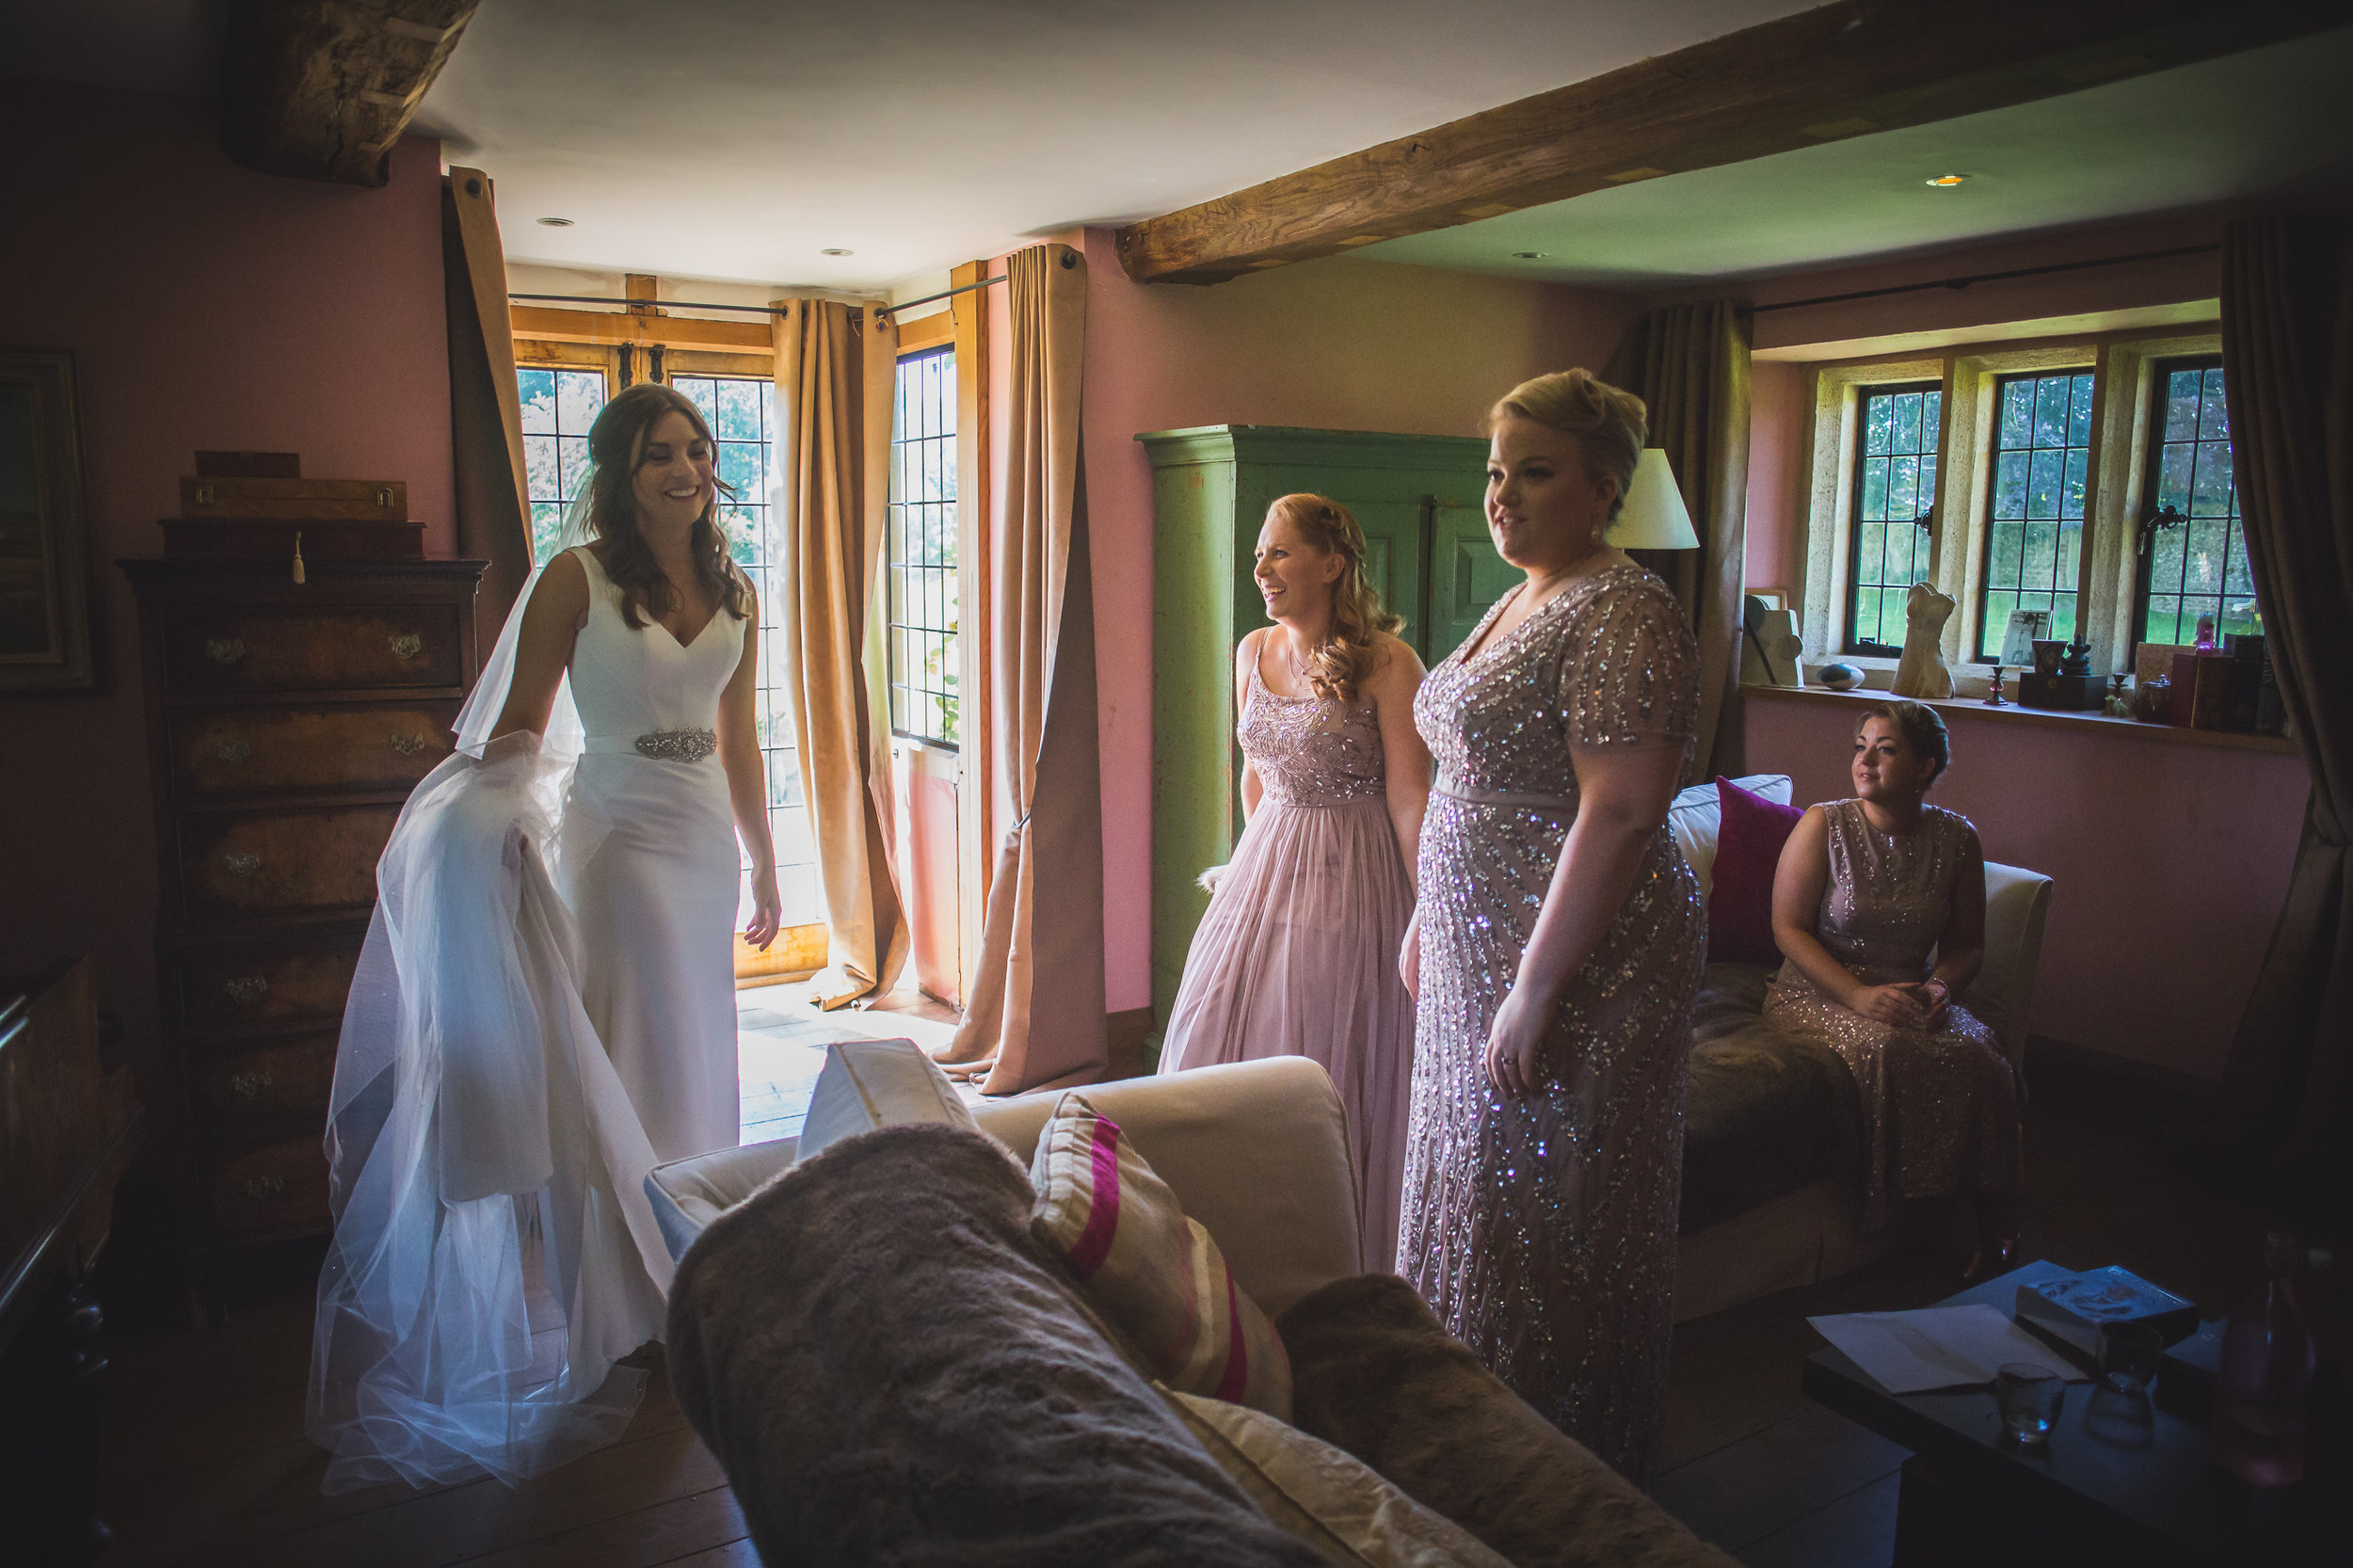 Grittenham Barn female wedding photographers west sussex petworth social-39.jpg